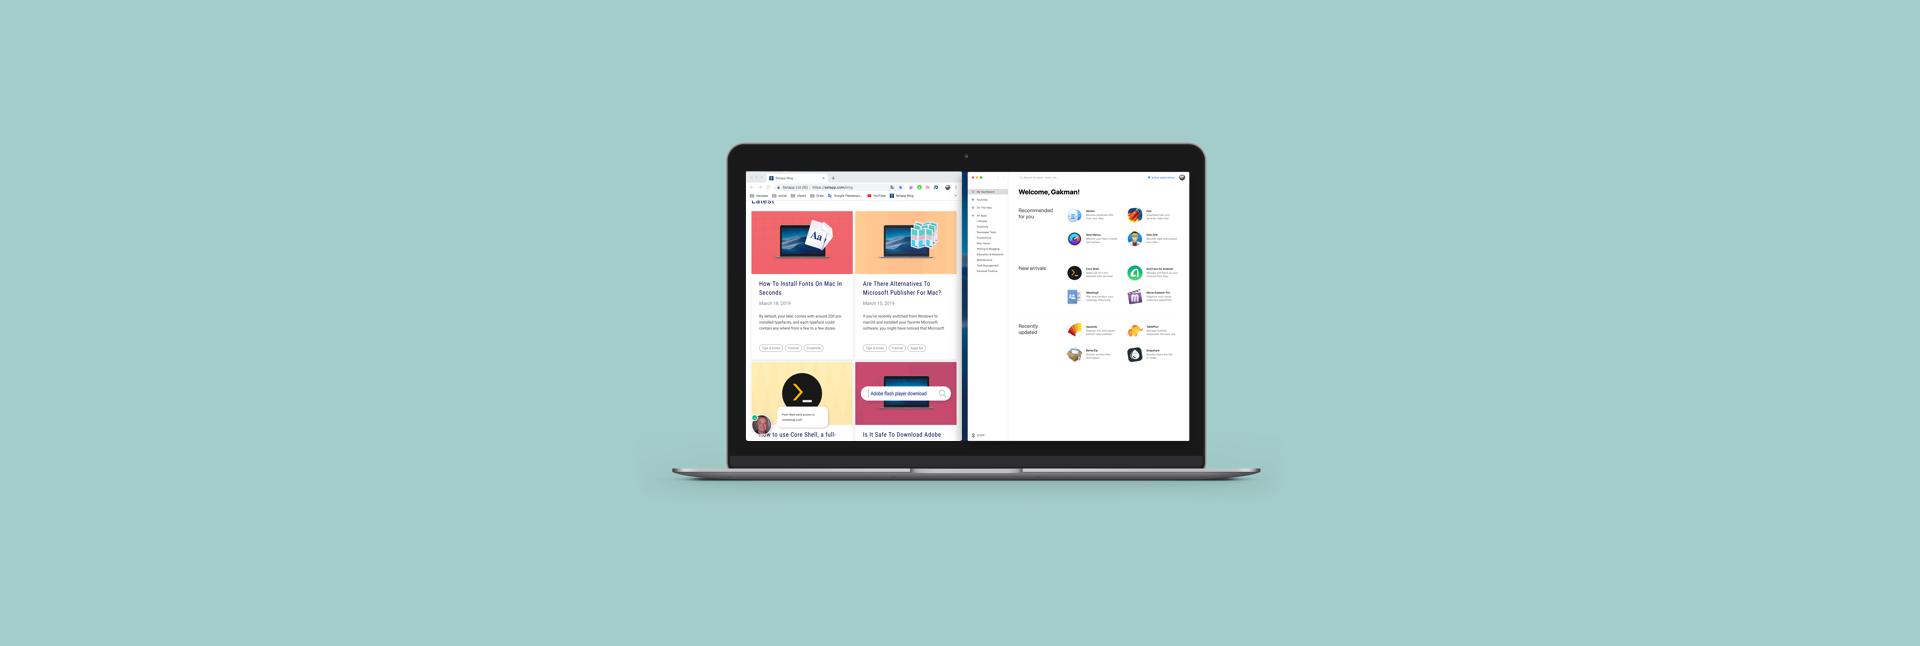 Master Split Screen On Mac For Extra Productivity – Setapp